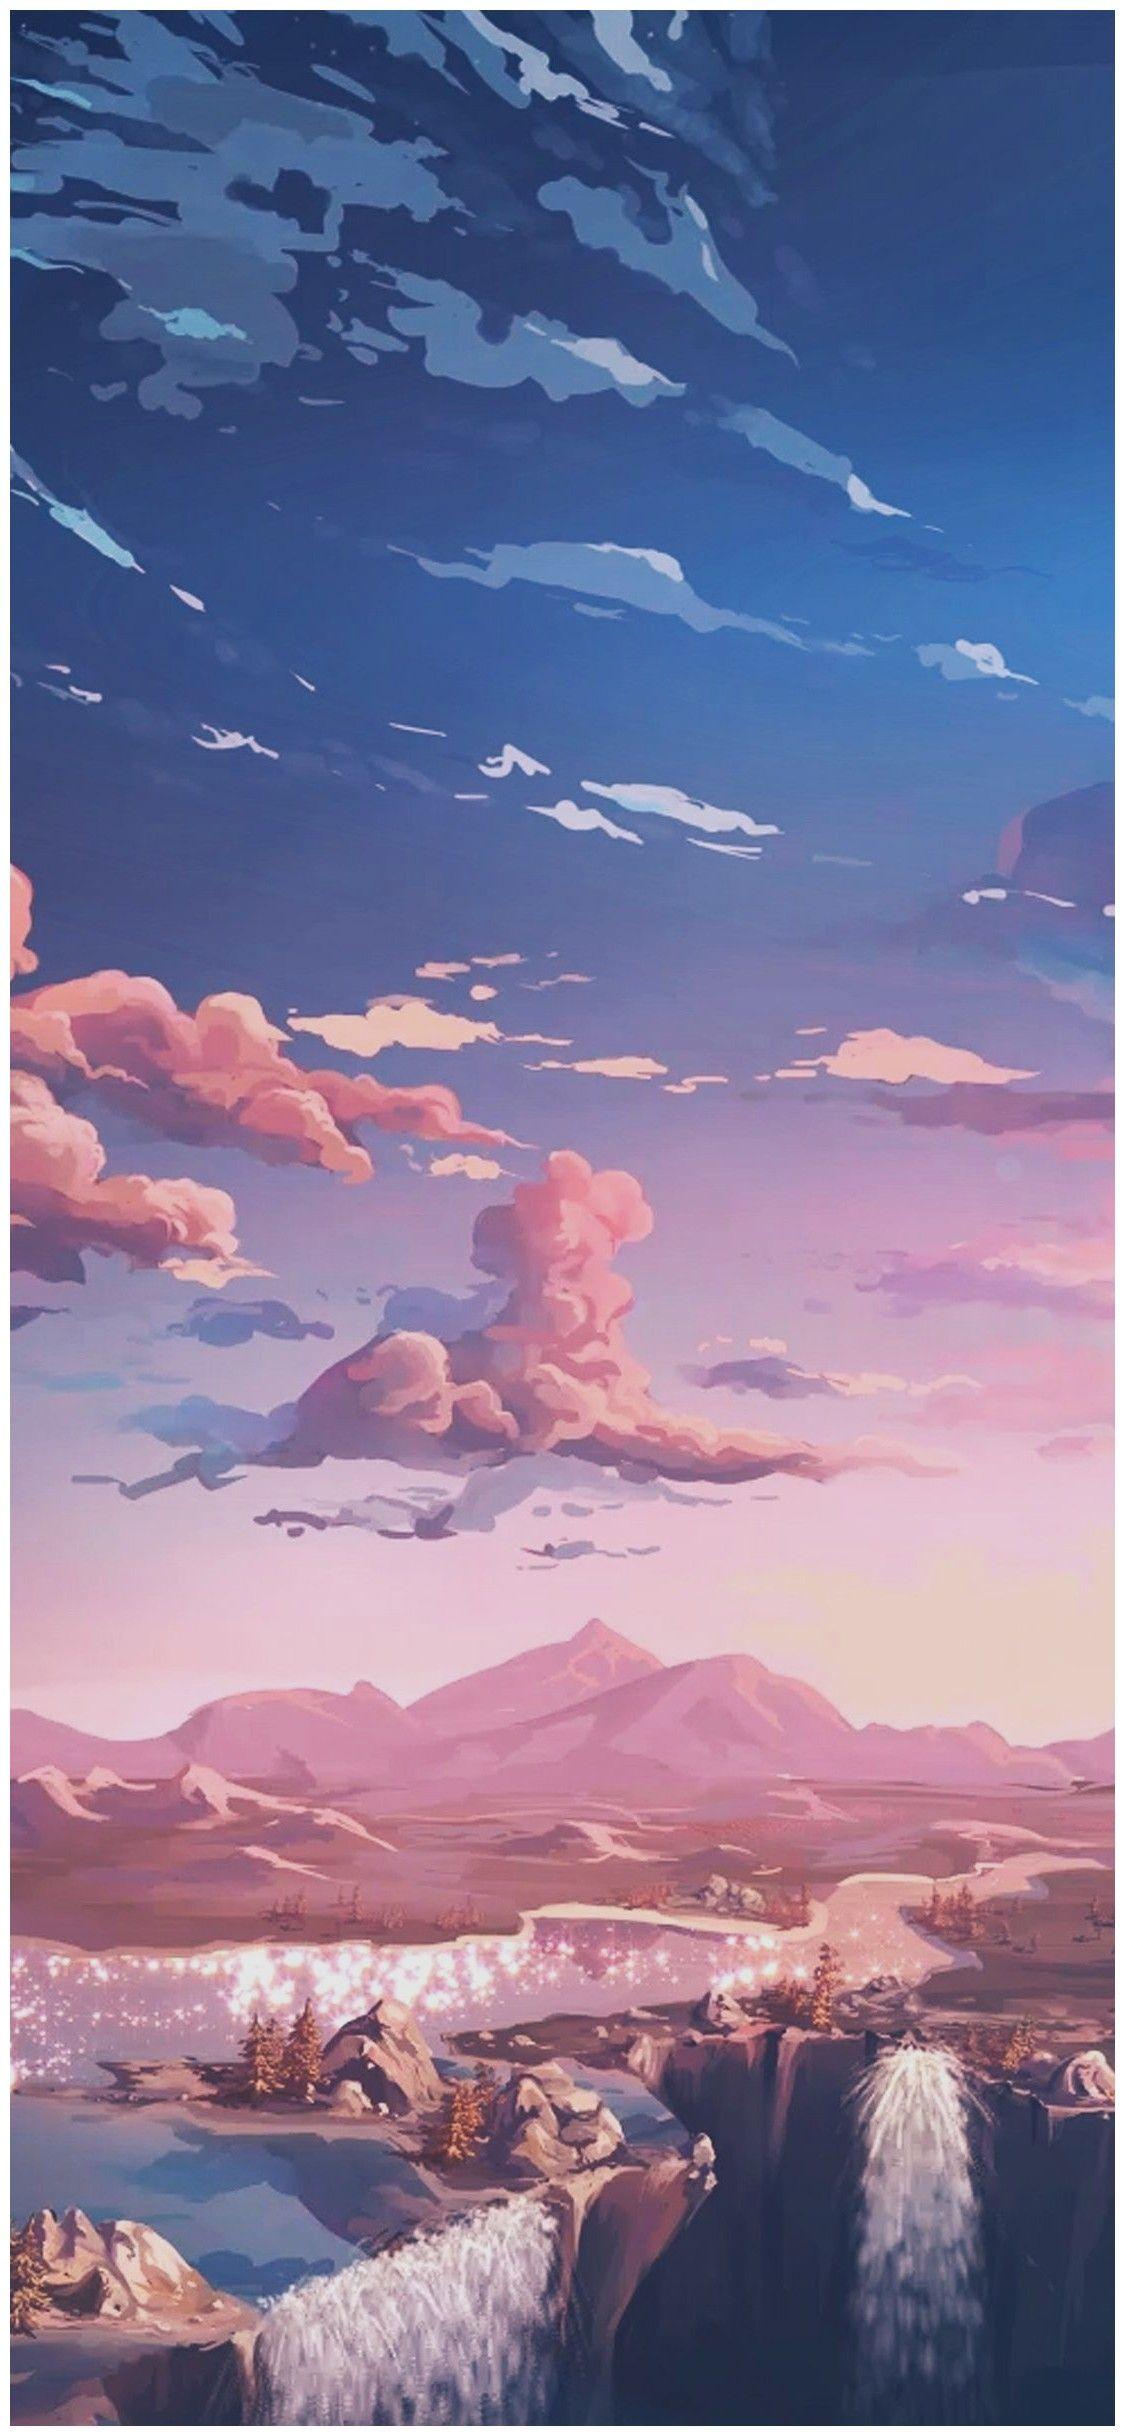 Aesthetic Tumblr Wallpaper Iphone Hd In 2020 Anime Wallpaper Iphone Anime Scenery Wallpaper Tumblr Iphone Wallpaper